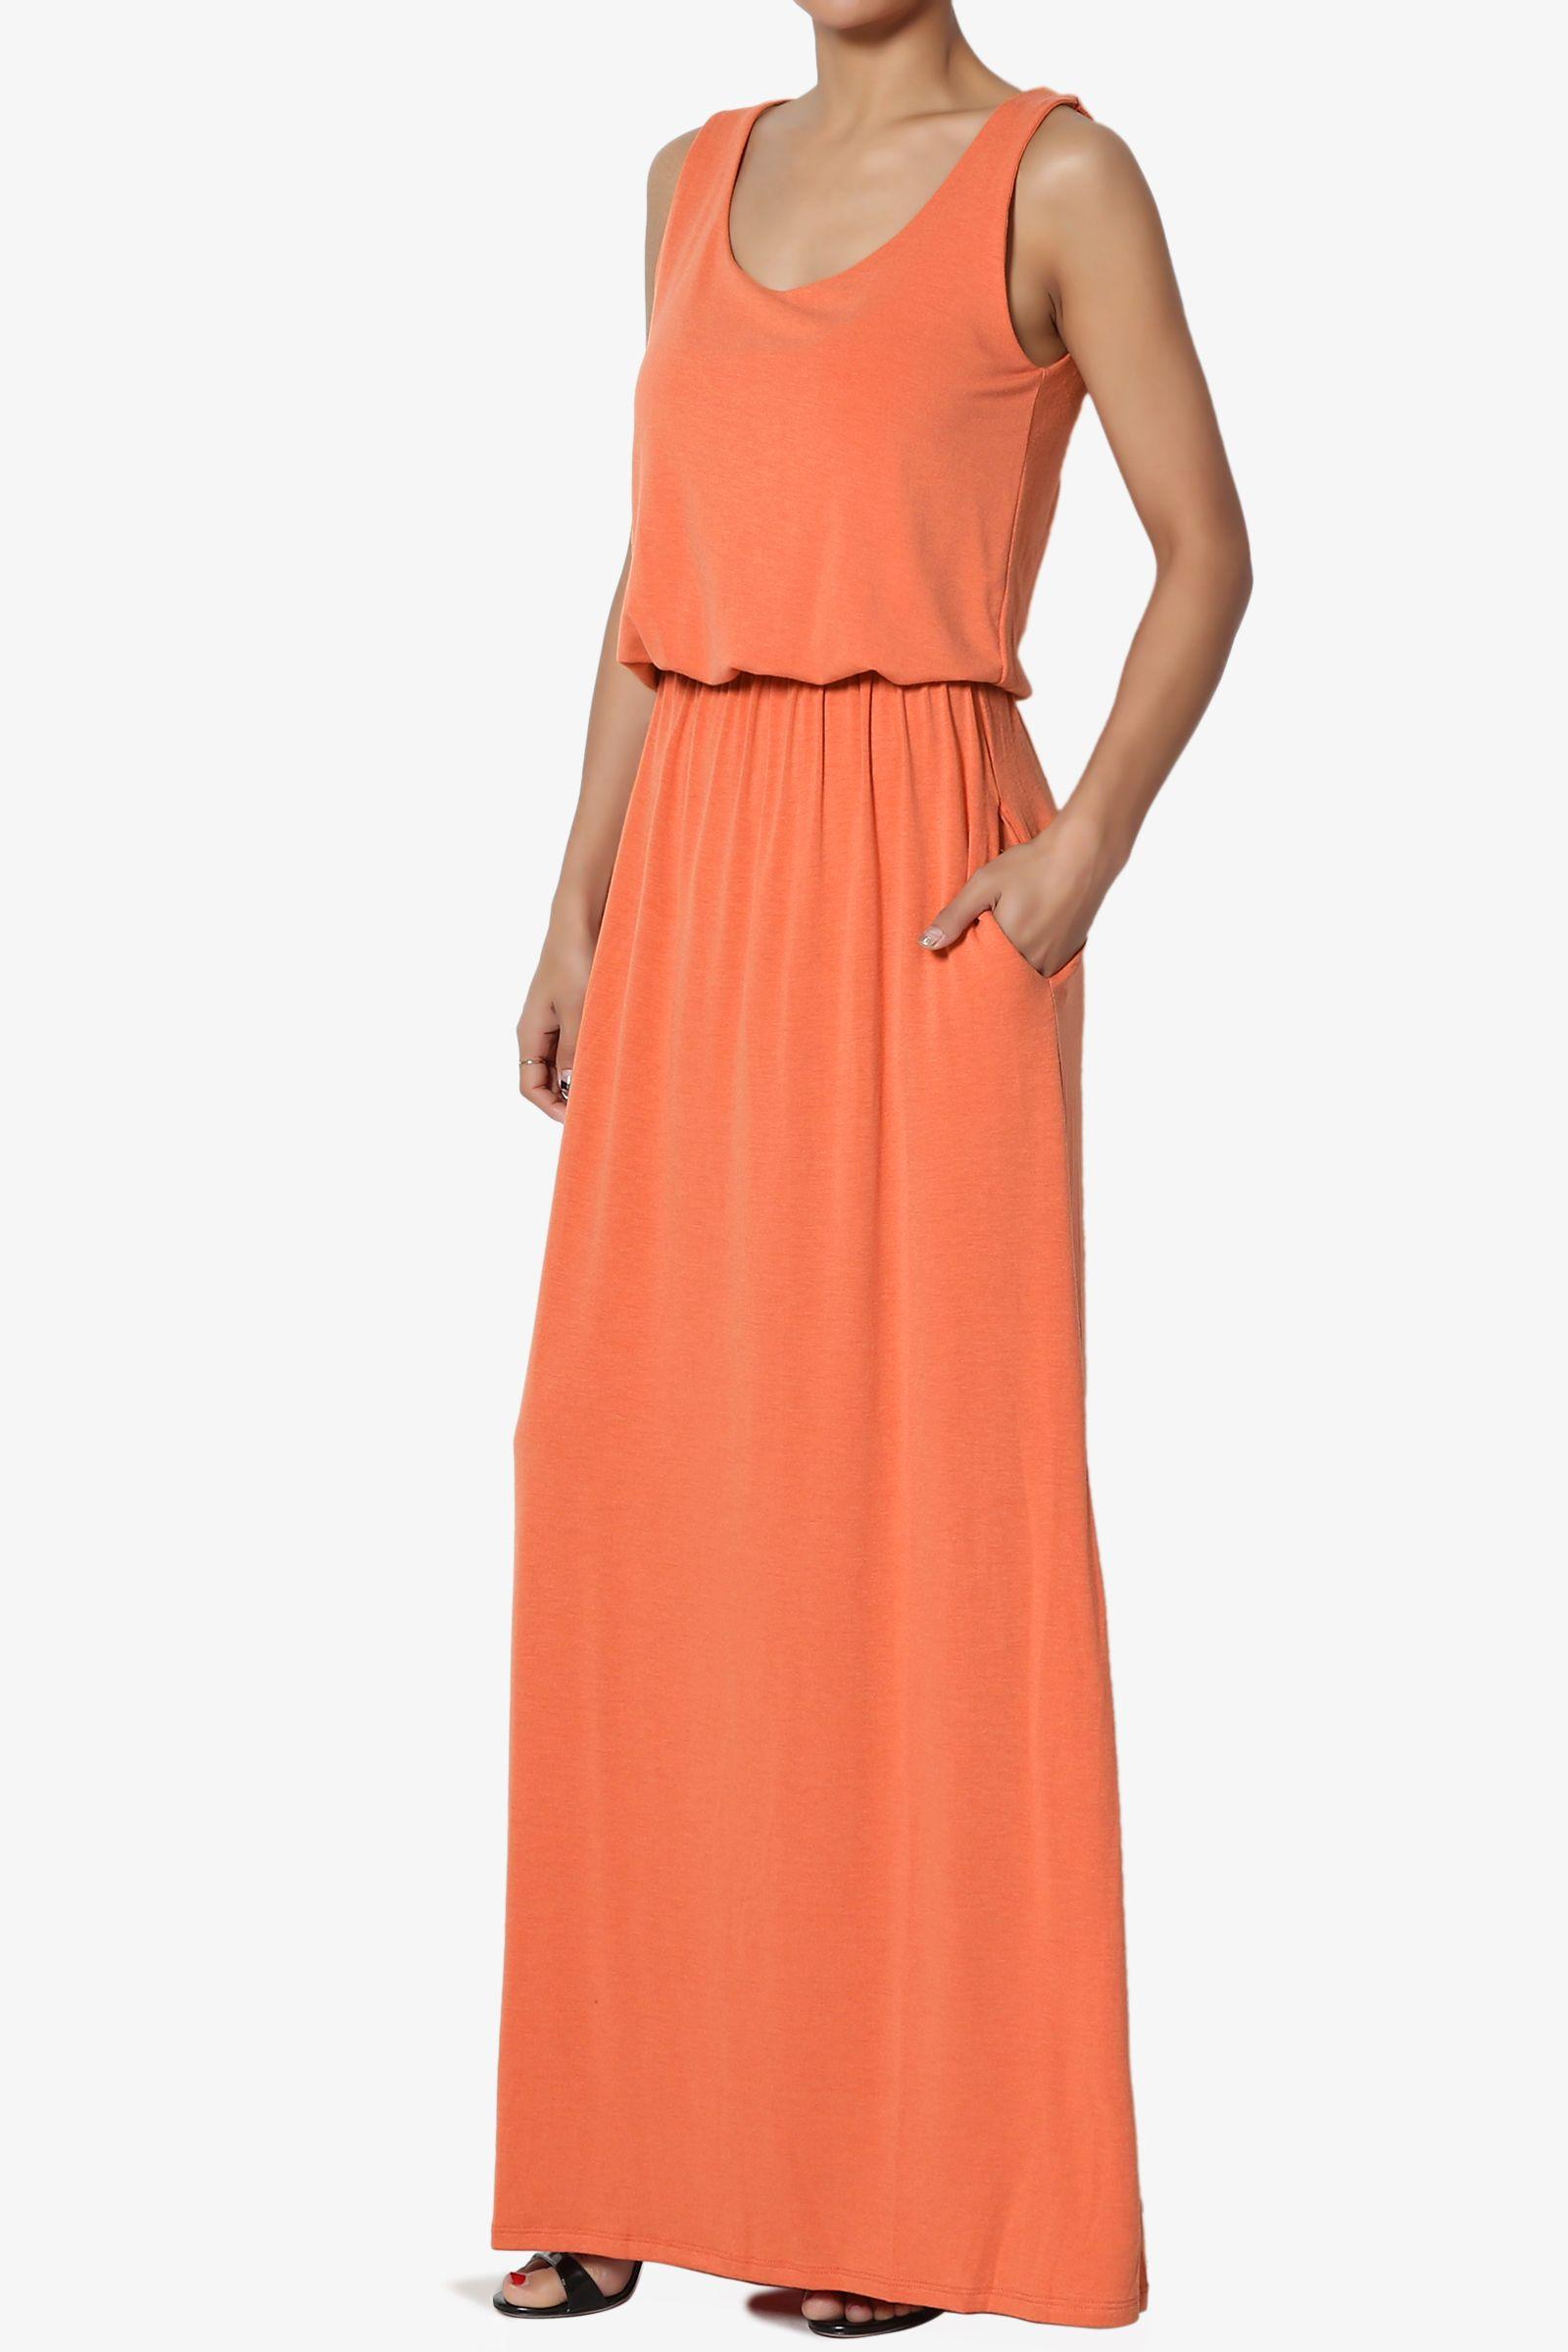 Themogan Themogan Women S S 3x Sleeveless Scoop Neck Blouson Tank Top Long Skirt Maxi Dress Walmart Com Maxi Dress Long Skirt Dresses [ 2400 x 1600 Pixel ]